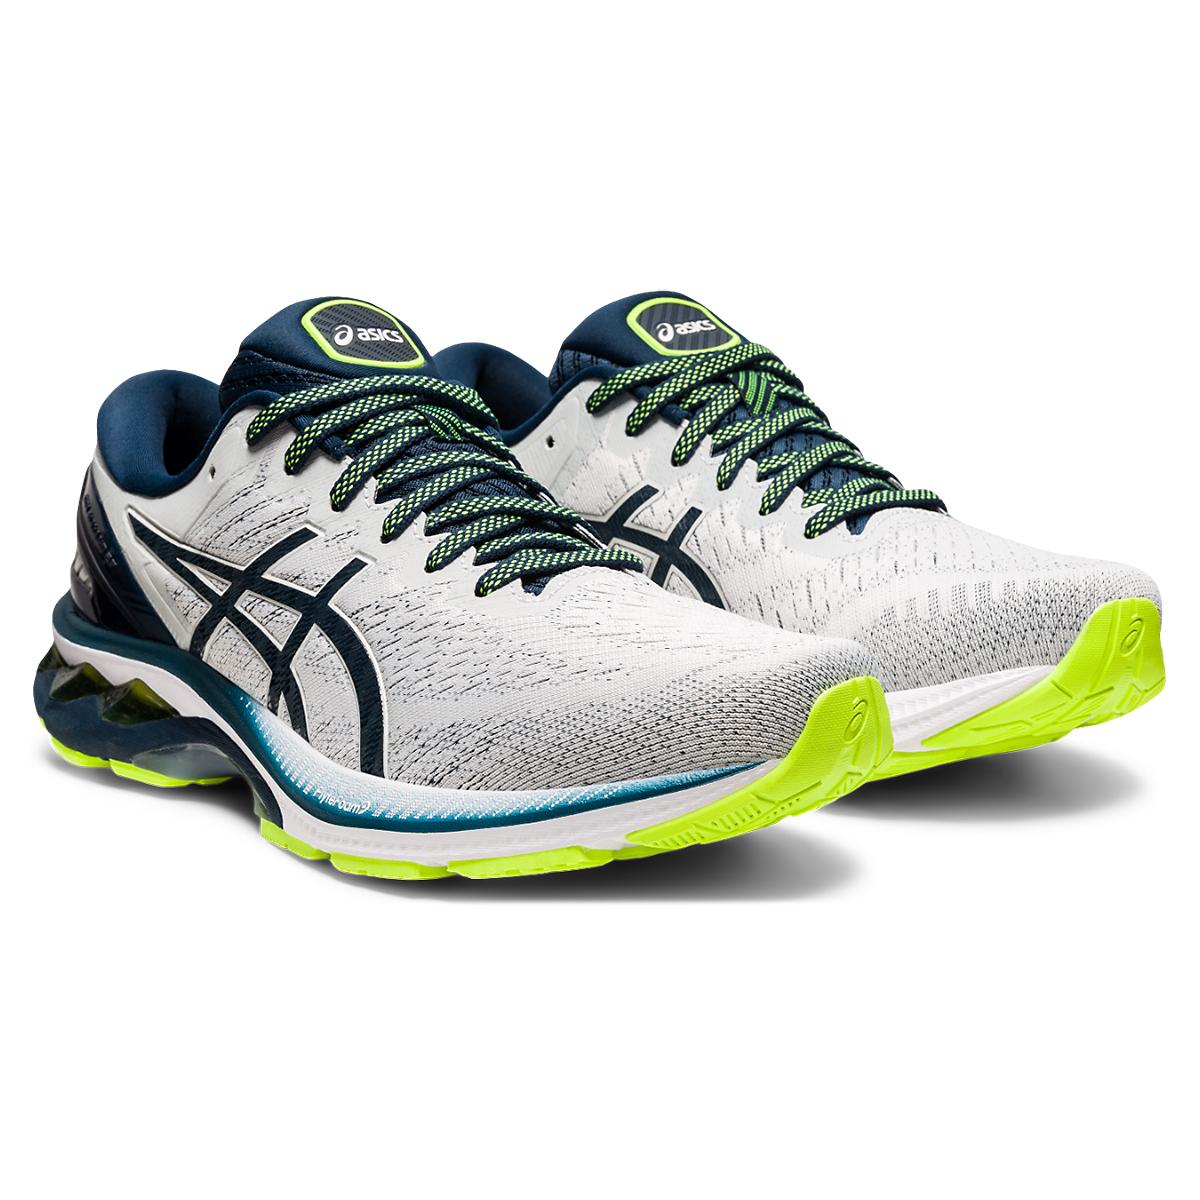 Men's Asics Gel-Kayano 27 Running Shoe - Color: Grey/Green/Blue - Size: 7 - Width: Regular, Grey/Green/Blue, large, image 4